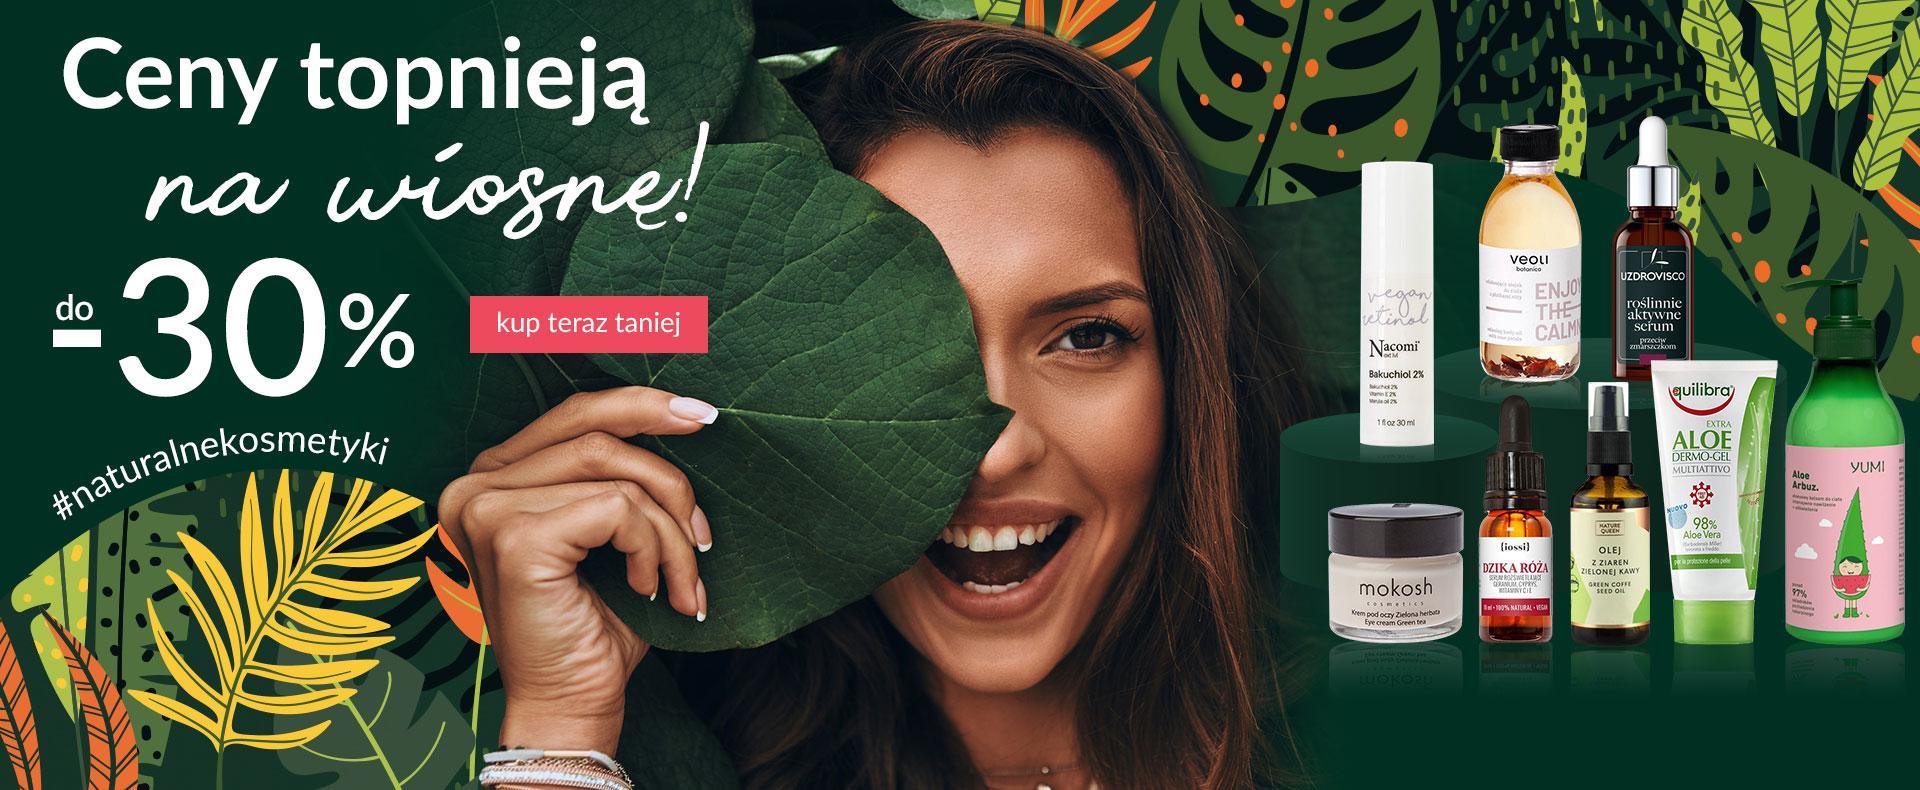 Ezebra Ezebra: do 30% rabatu na kosmetyki naturalne wielu marek